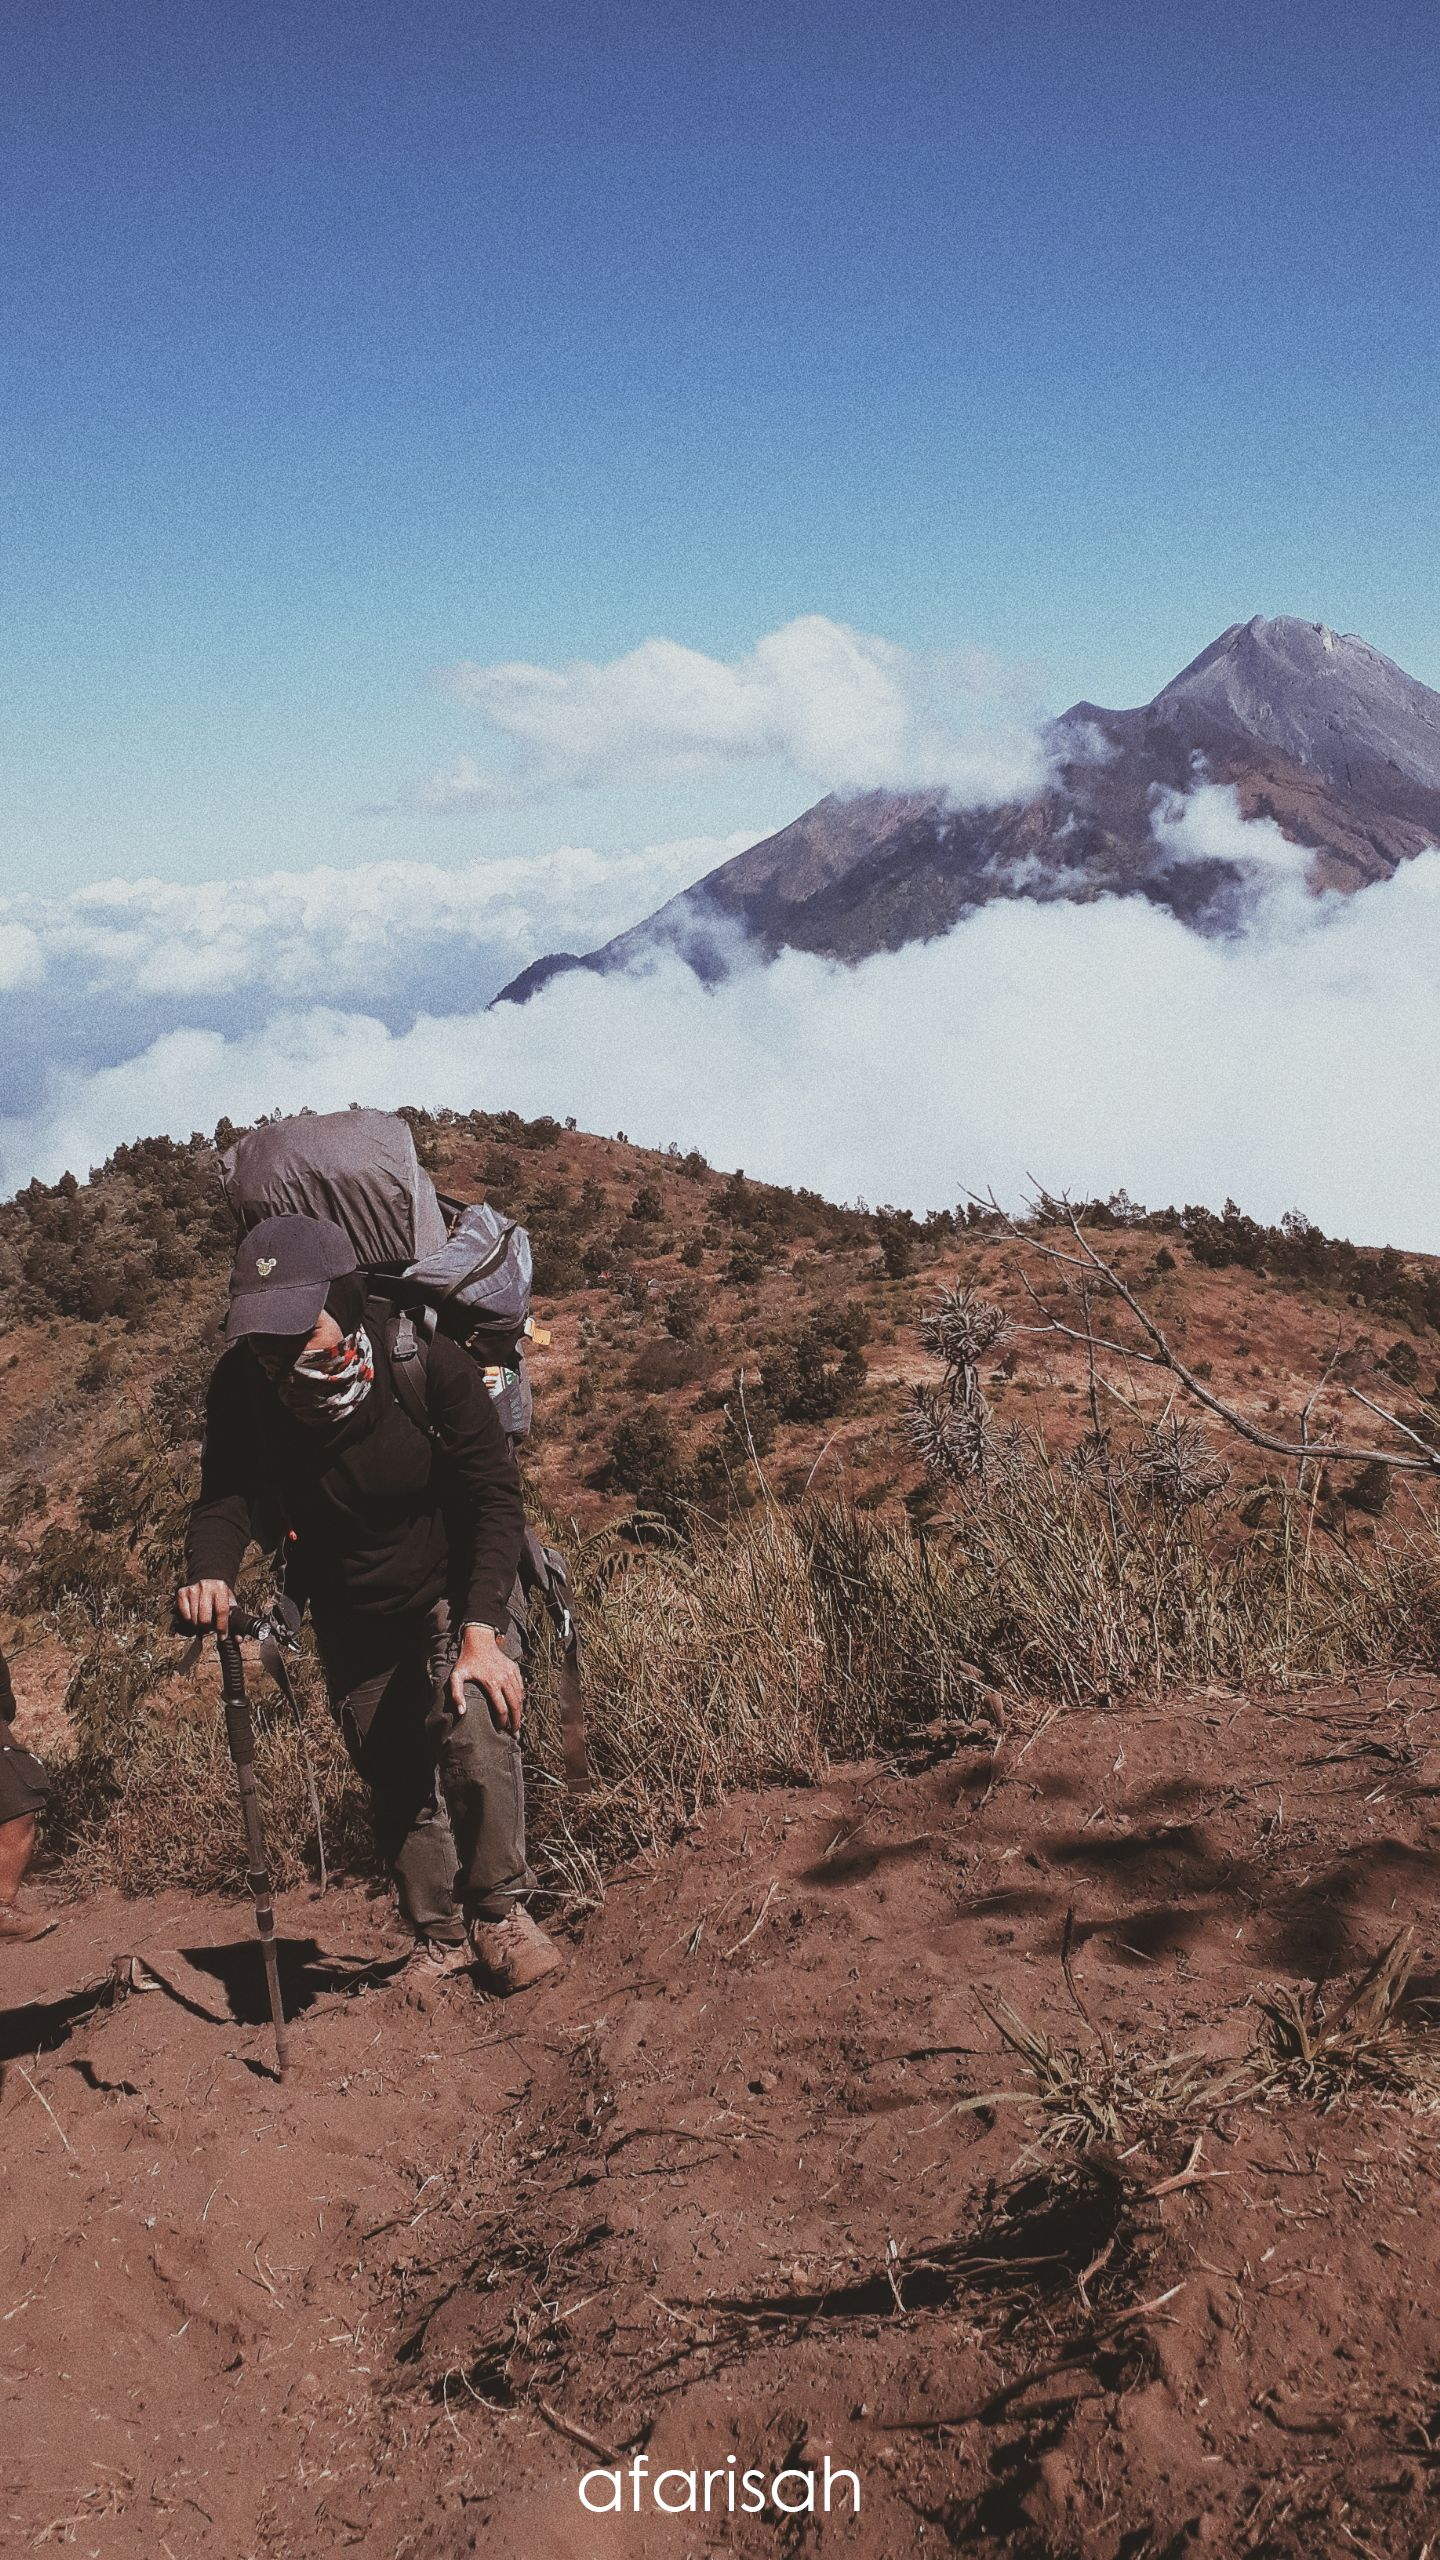 Push Your Limit You E More Stronger Than You Have Ever Think Before Afarisah Merbabu Mountain Indonesia Pemandangan Fotografi Alam Gambar Kota